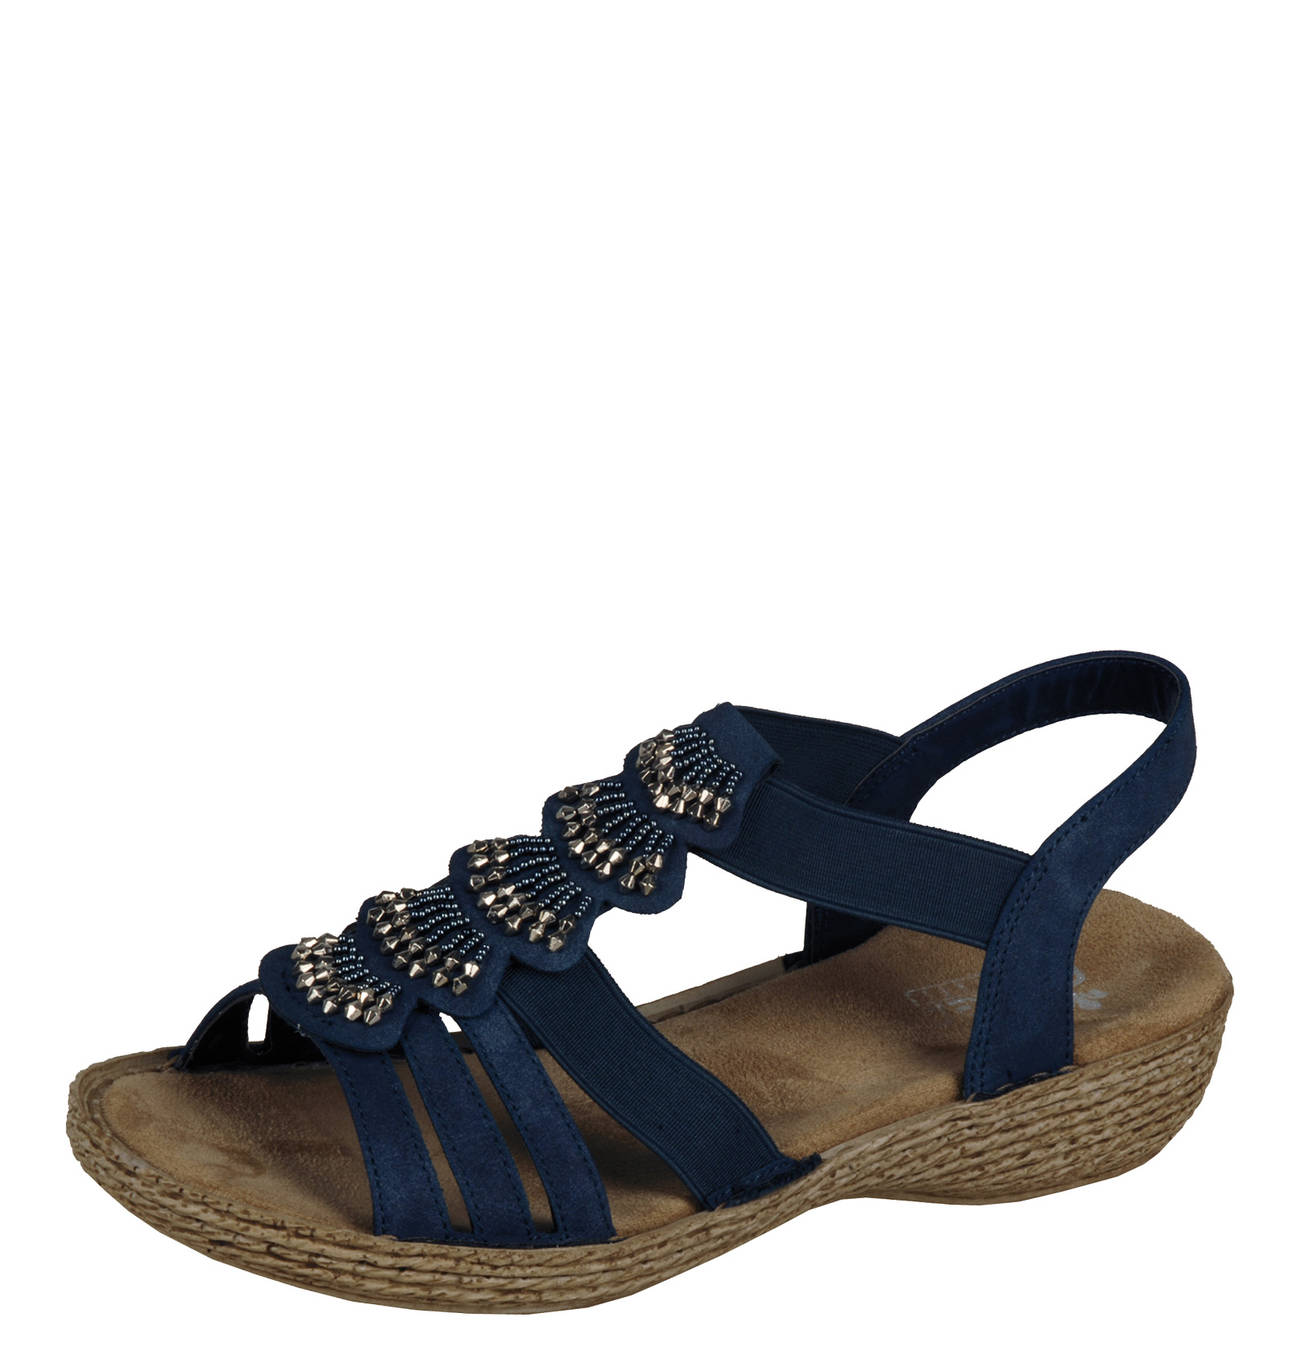 RIEKER Sandalen Sandaletten Damen schwarz Kostenloser